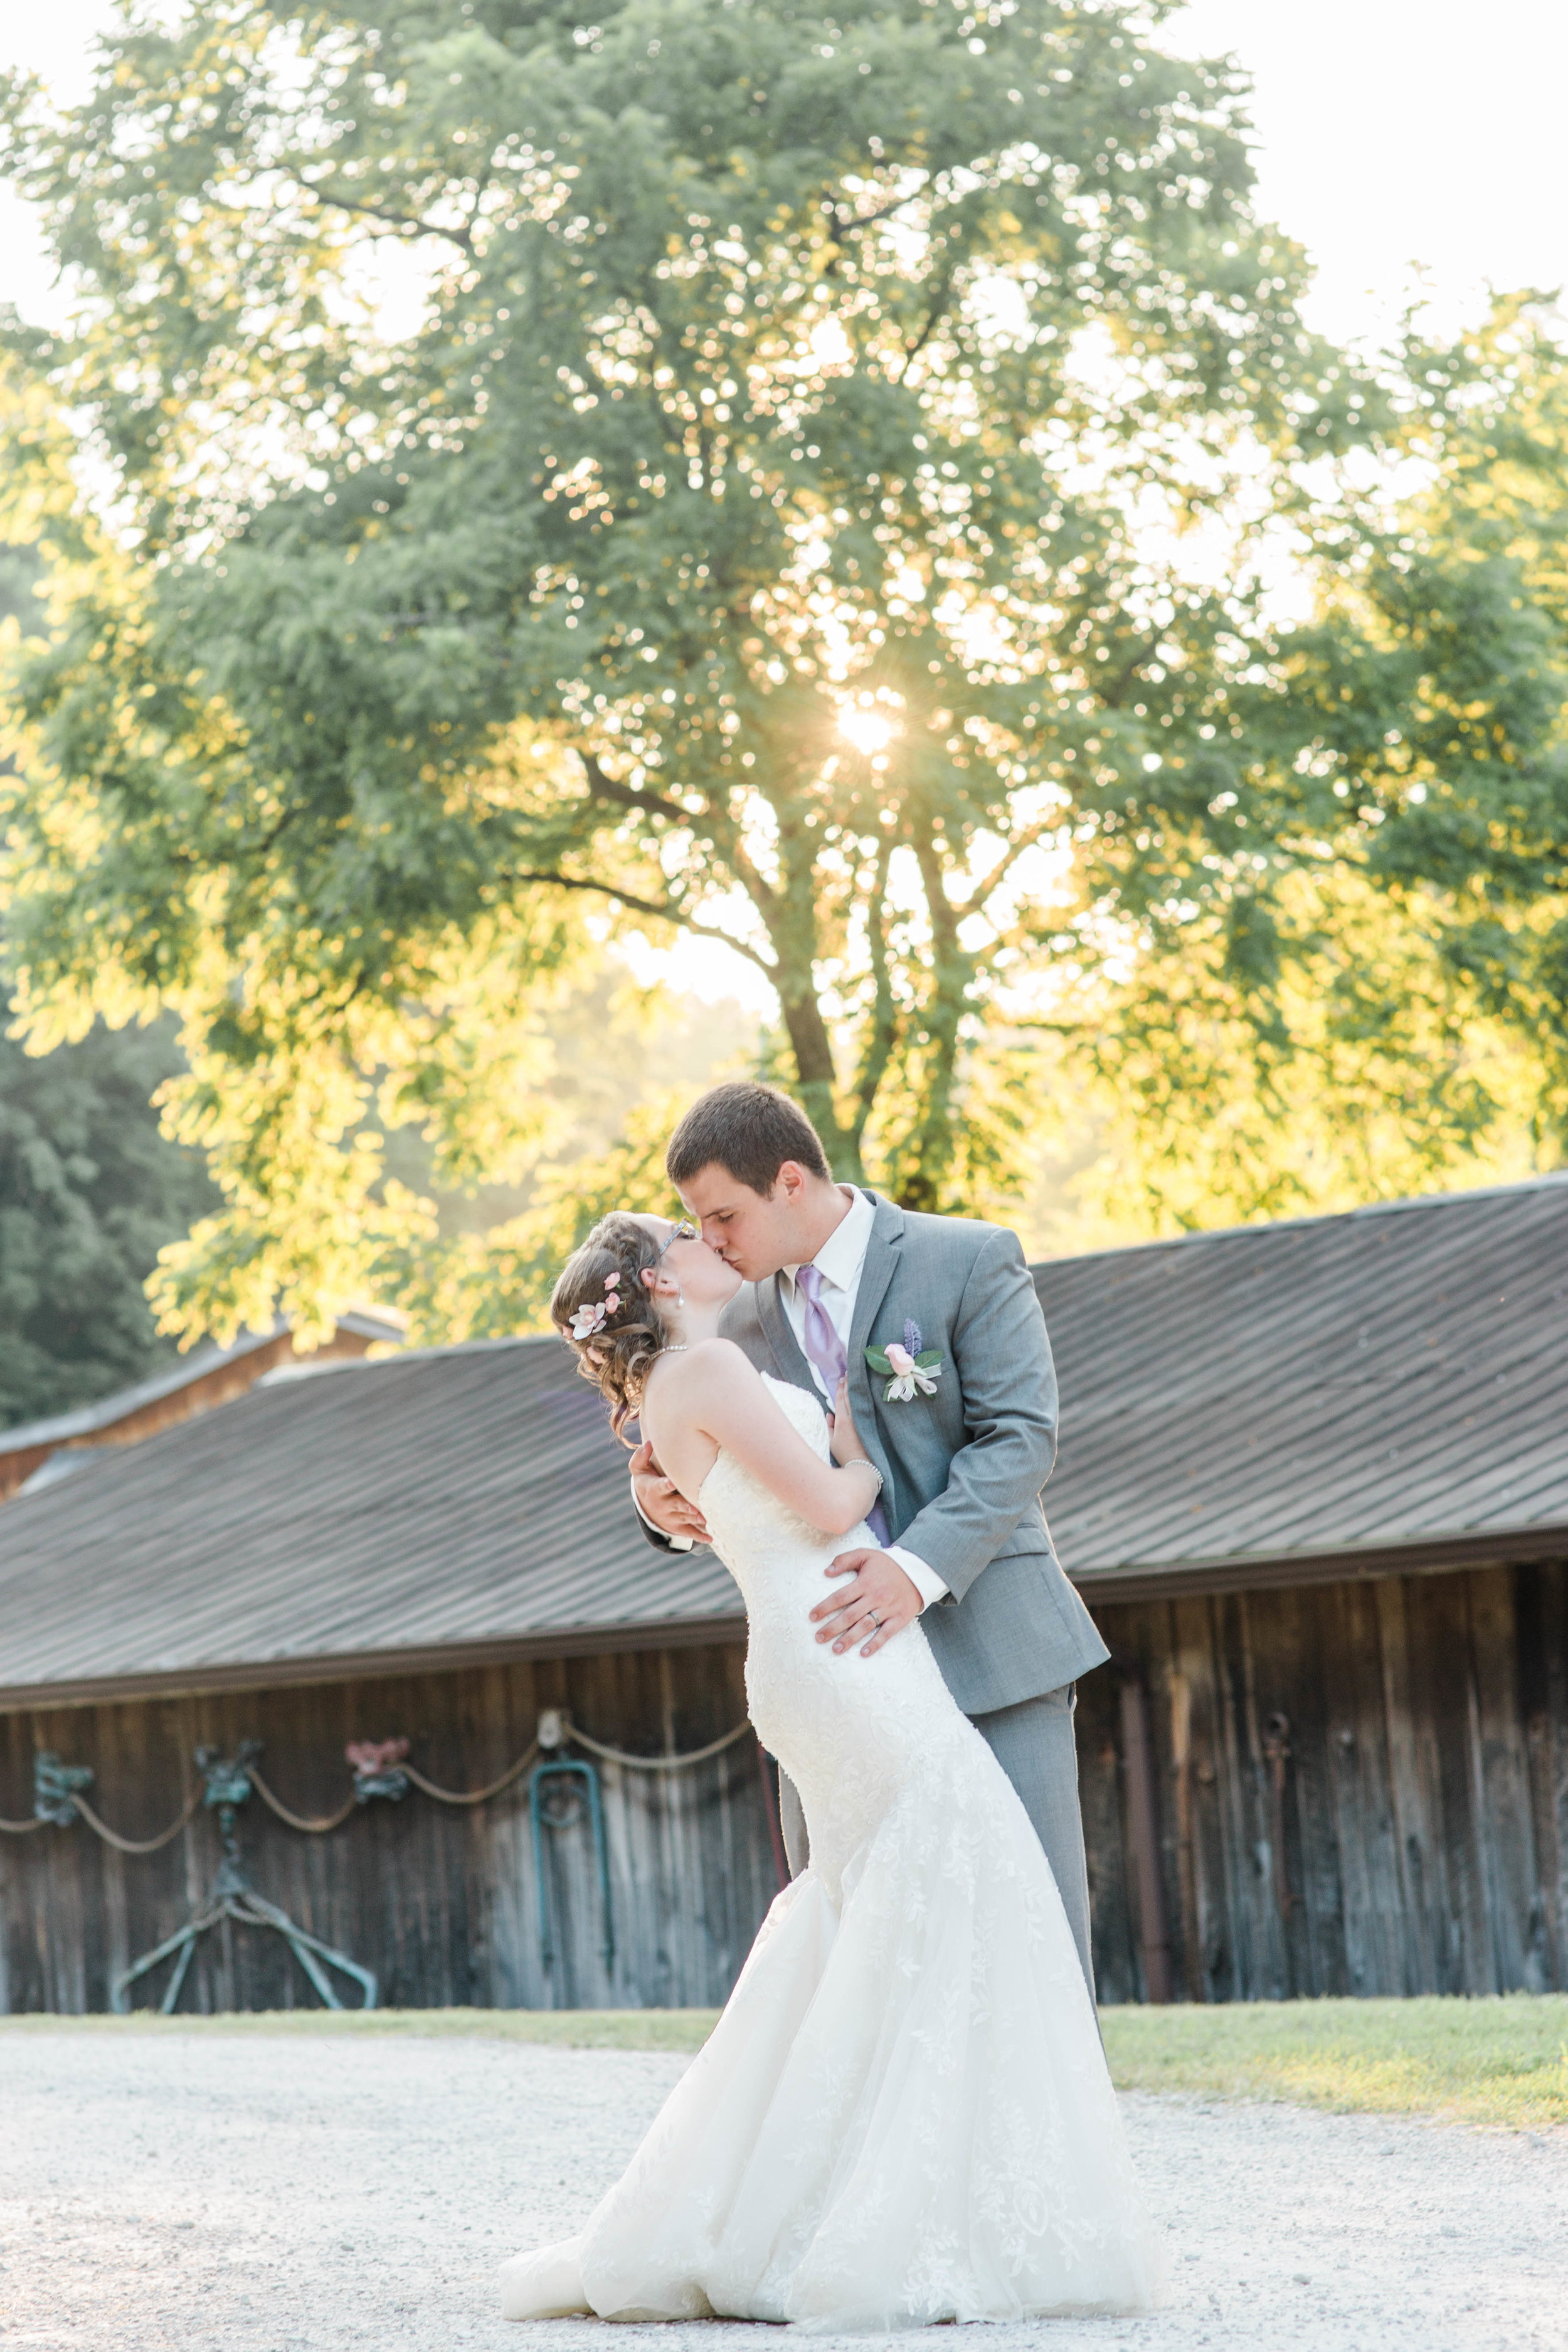 Taylor_Austin_Heritage_Farm_Wedding_Kara_Blakeman_Photography_2018-0541.jpg